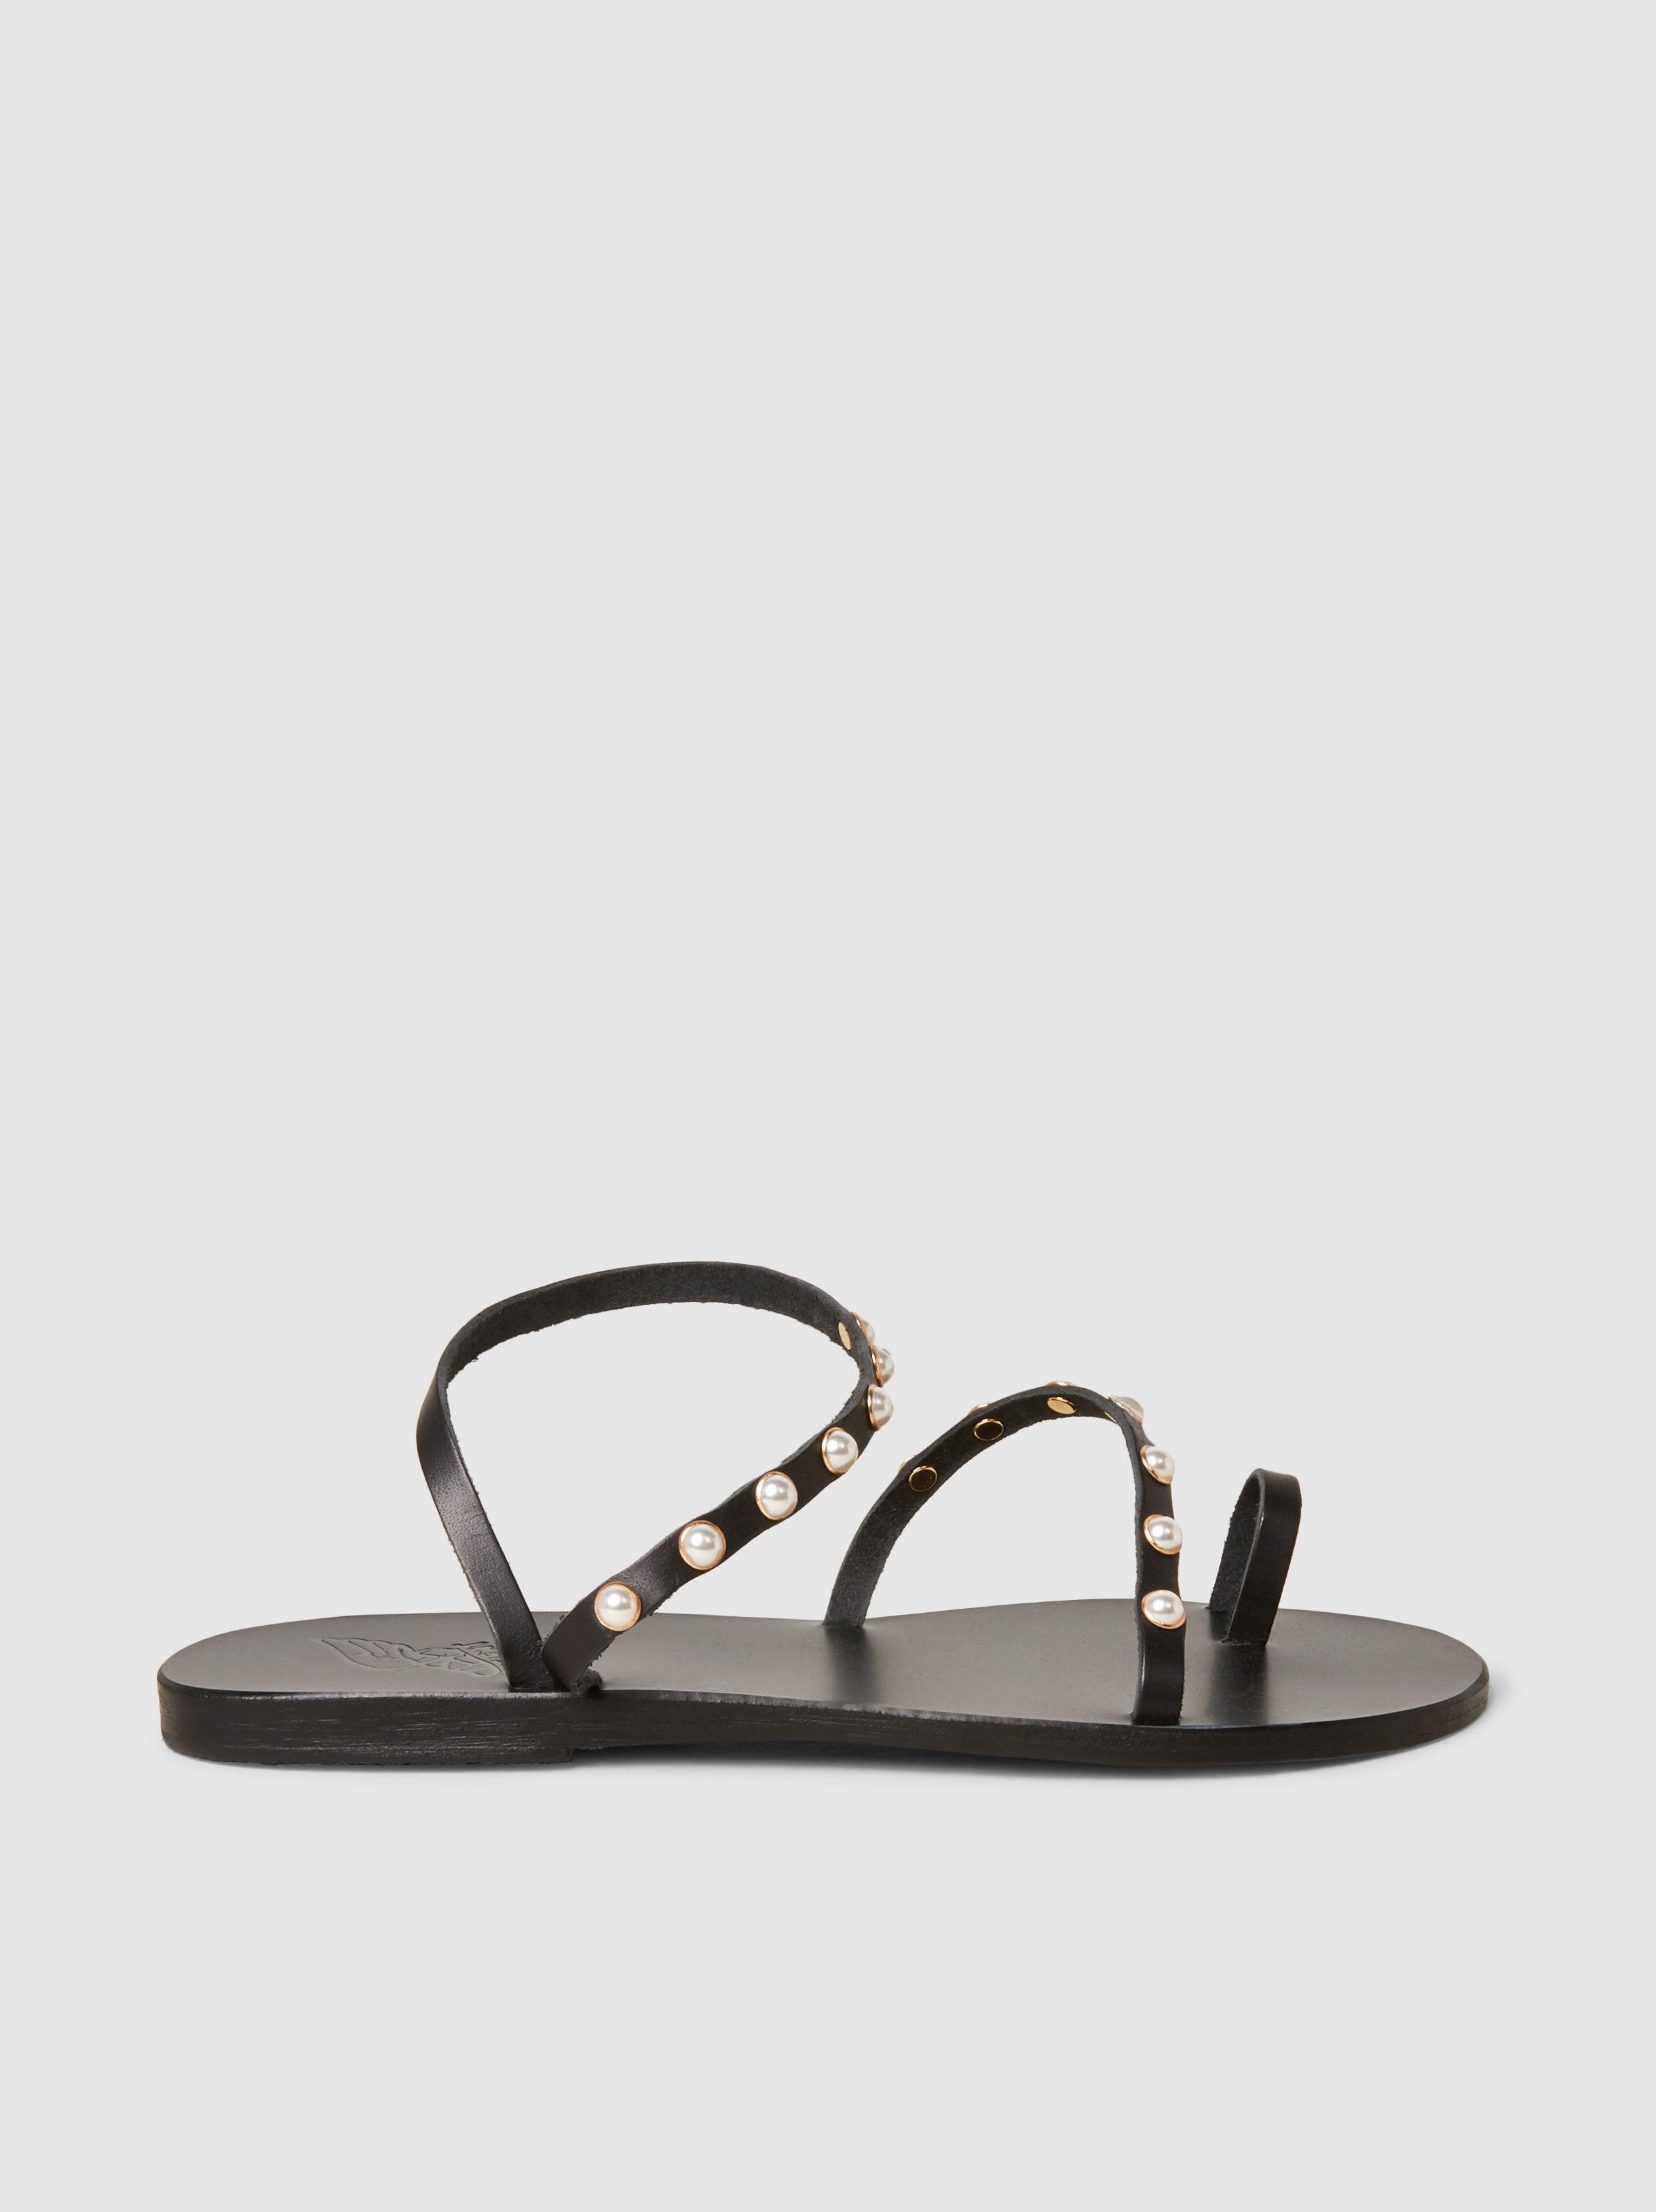 442c3be97 Ancient Greek Sandals. Women s Black Apli Leather Elefthera Pearls Sandal